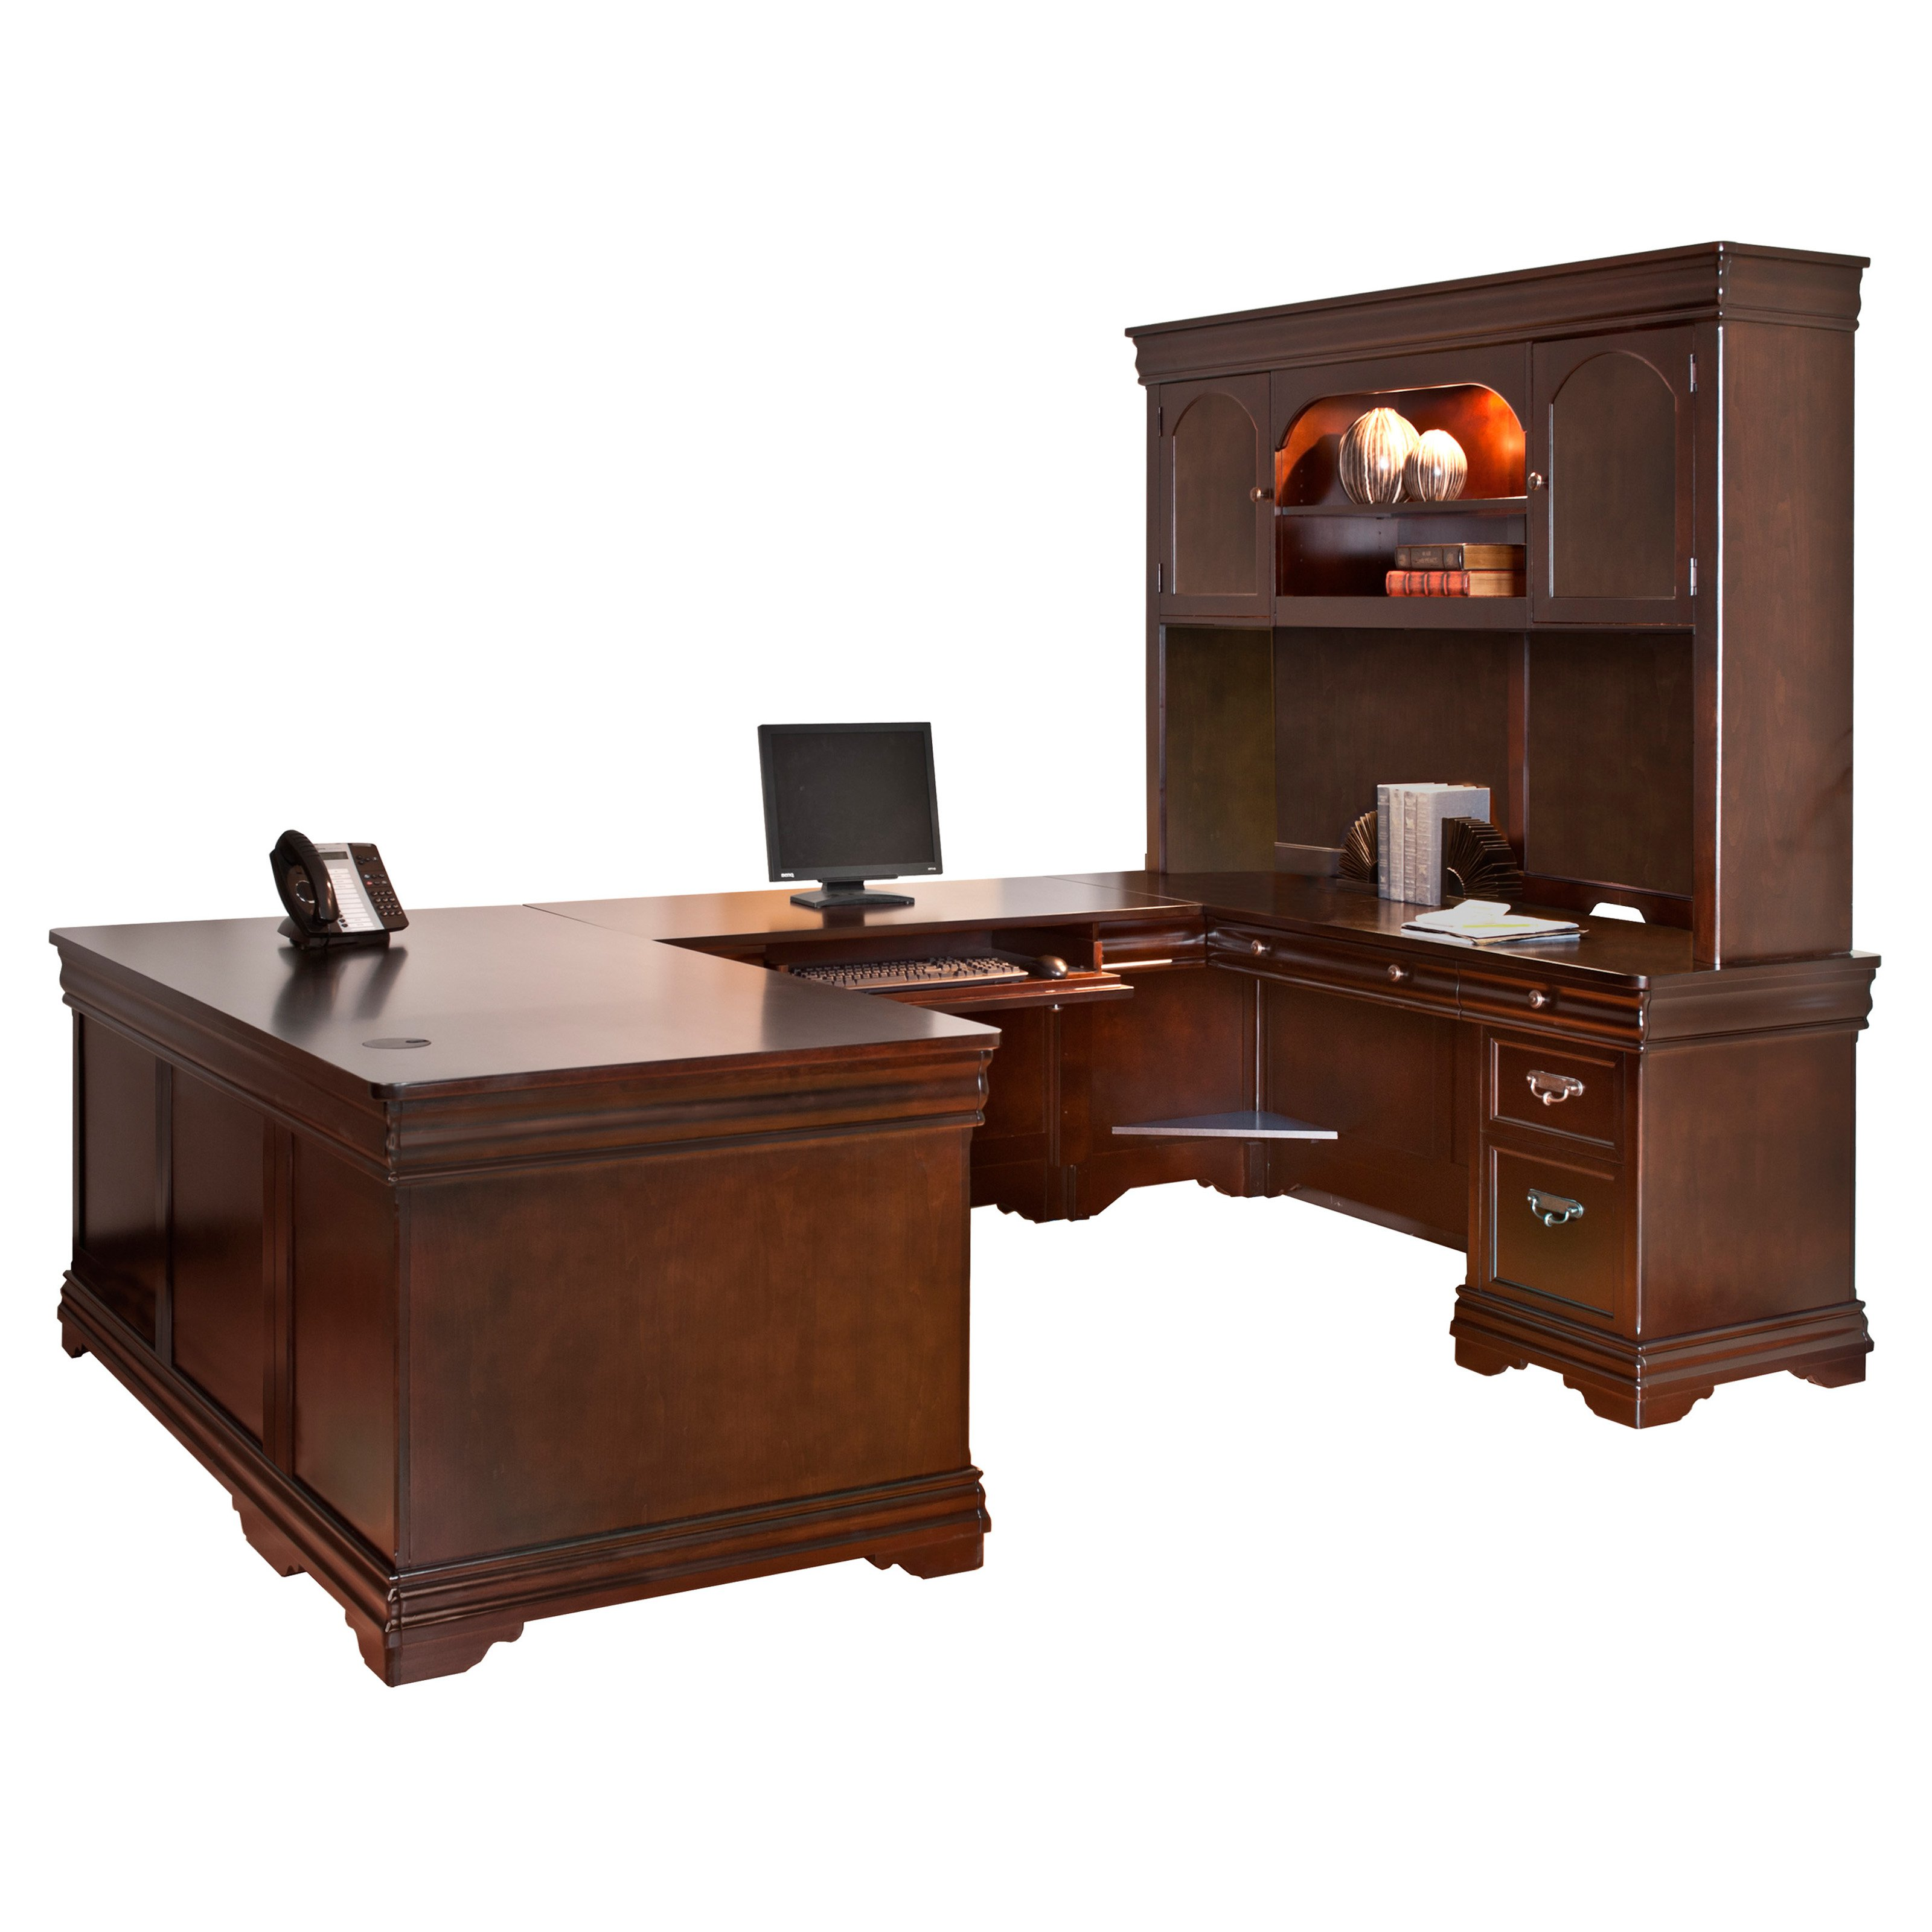 Martin Furniture Avondale Credenza TV Stand Walmart